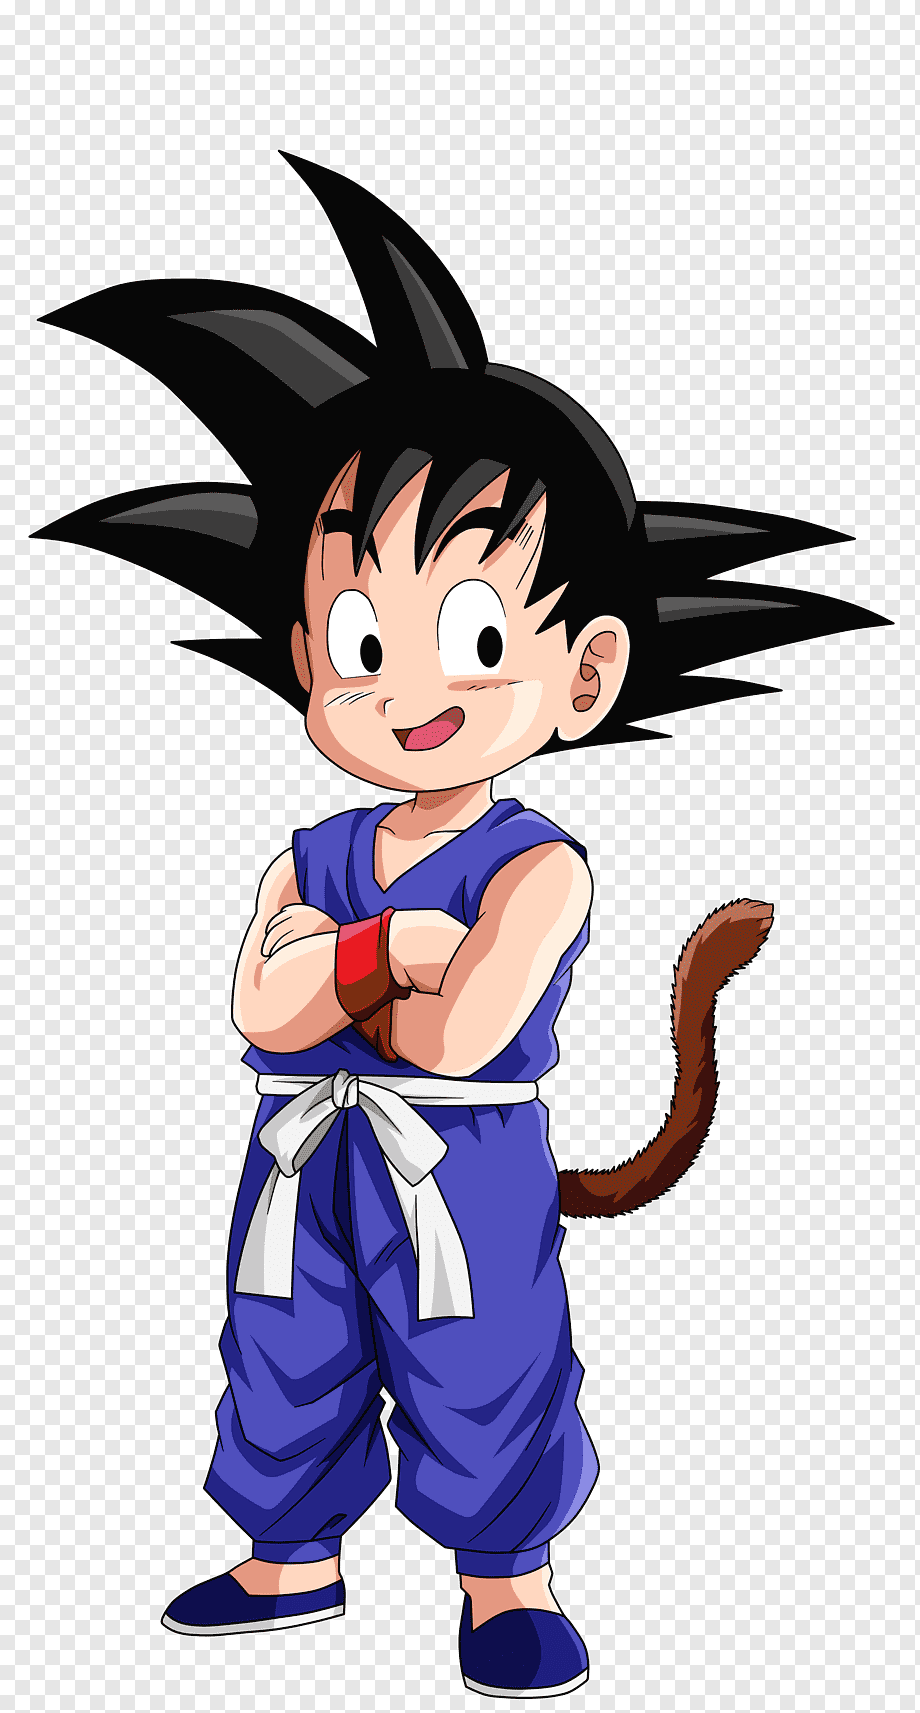 Son Goku Goku Frieza Vegeta Goten Gohan Dragon Ball Kid Goku Dragon Ball 2986763 Hd Wallpaper Backgrounds Download